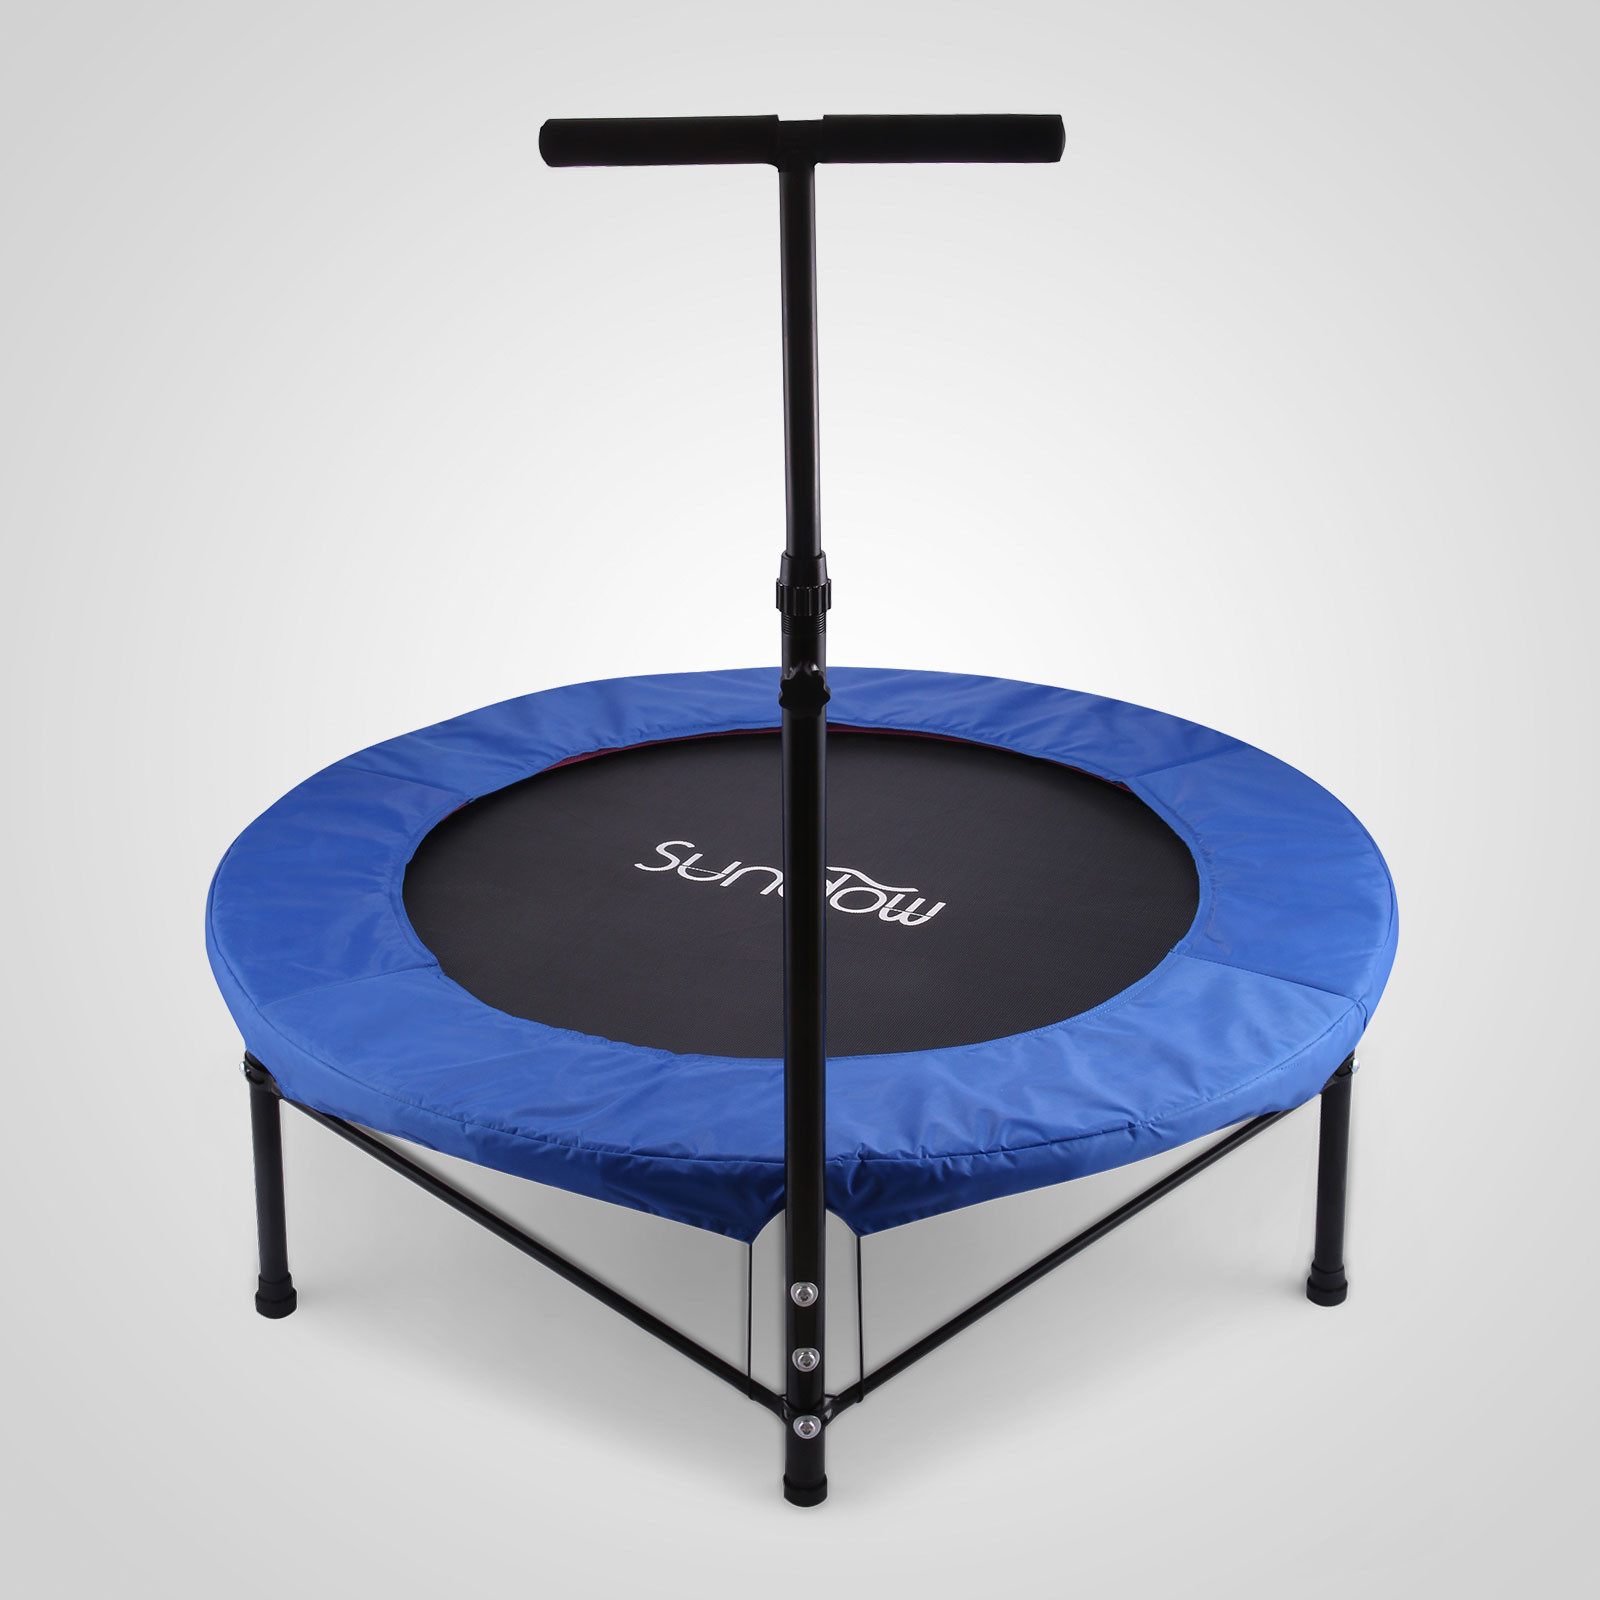 40 mini trampoline fitness jumper handle portable gym jump handle adjustable ebay. Black Bedroom Furniture Sets. Home Design Ideas